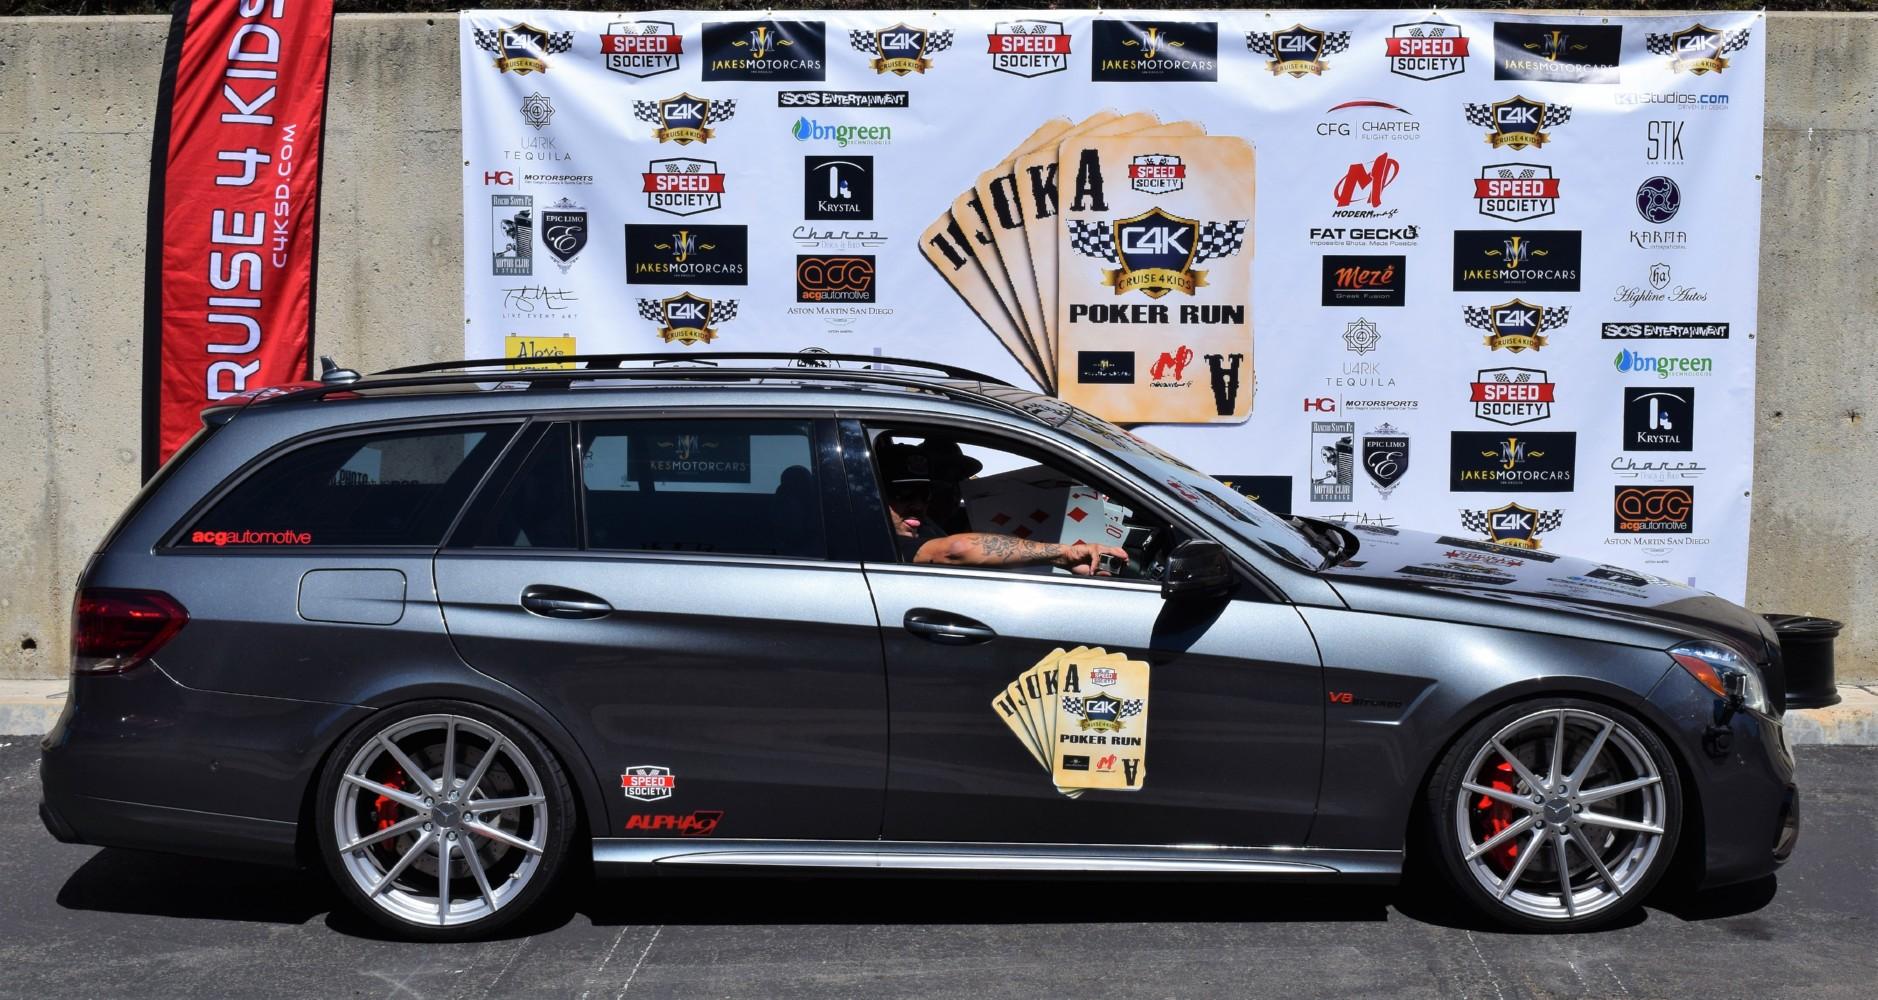 Poker Run 2017 Banner Photos - 45.jpg